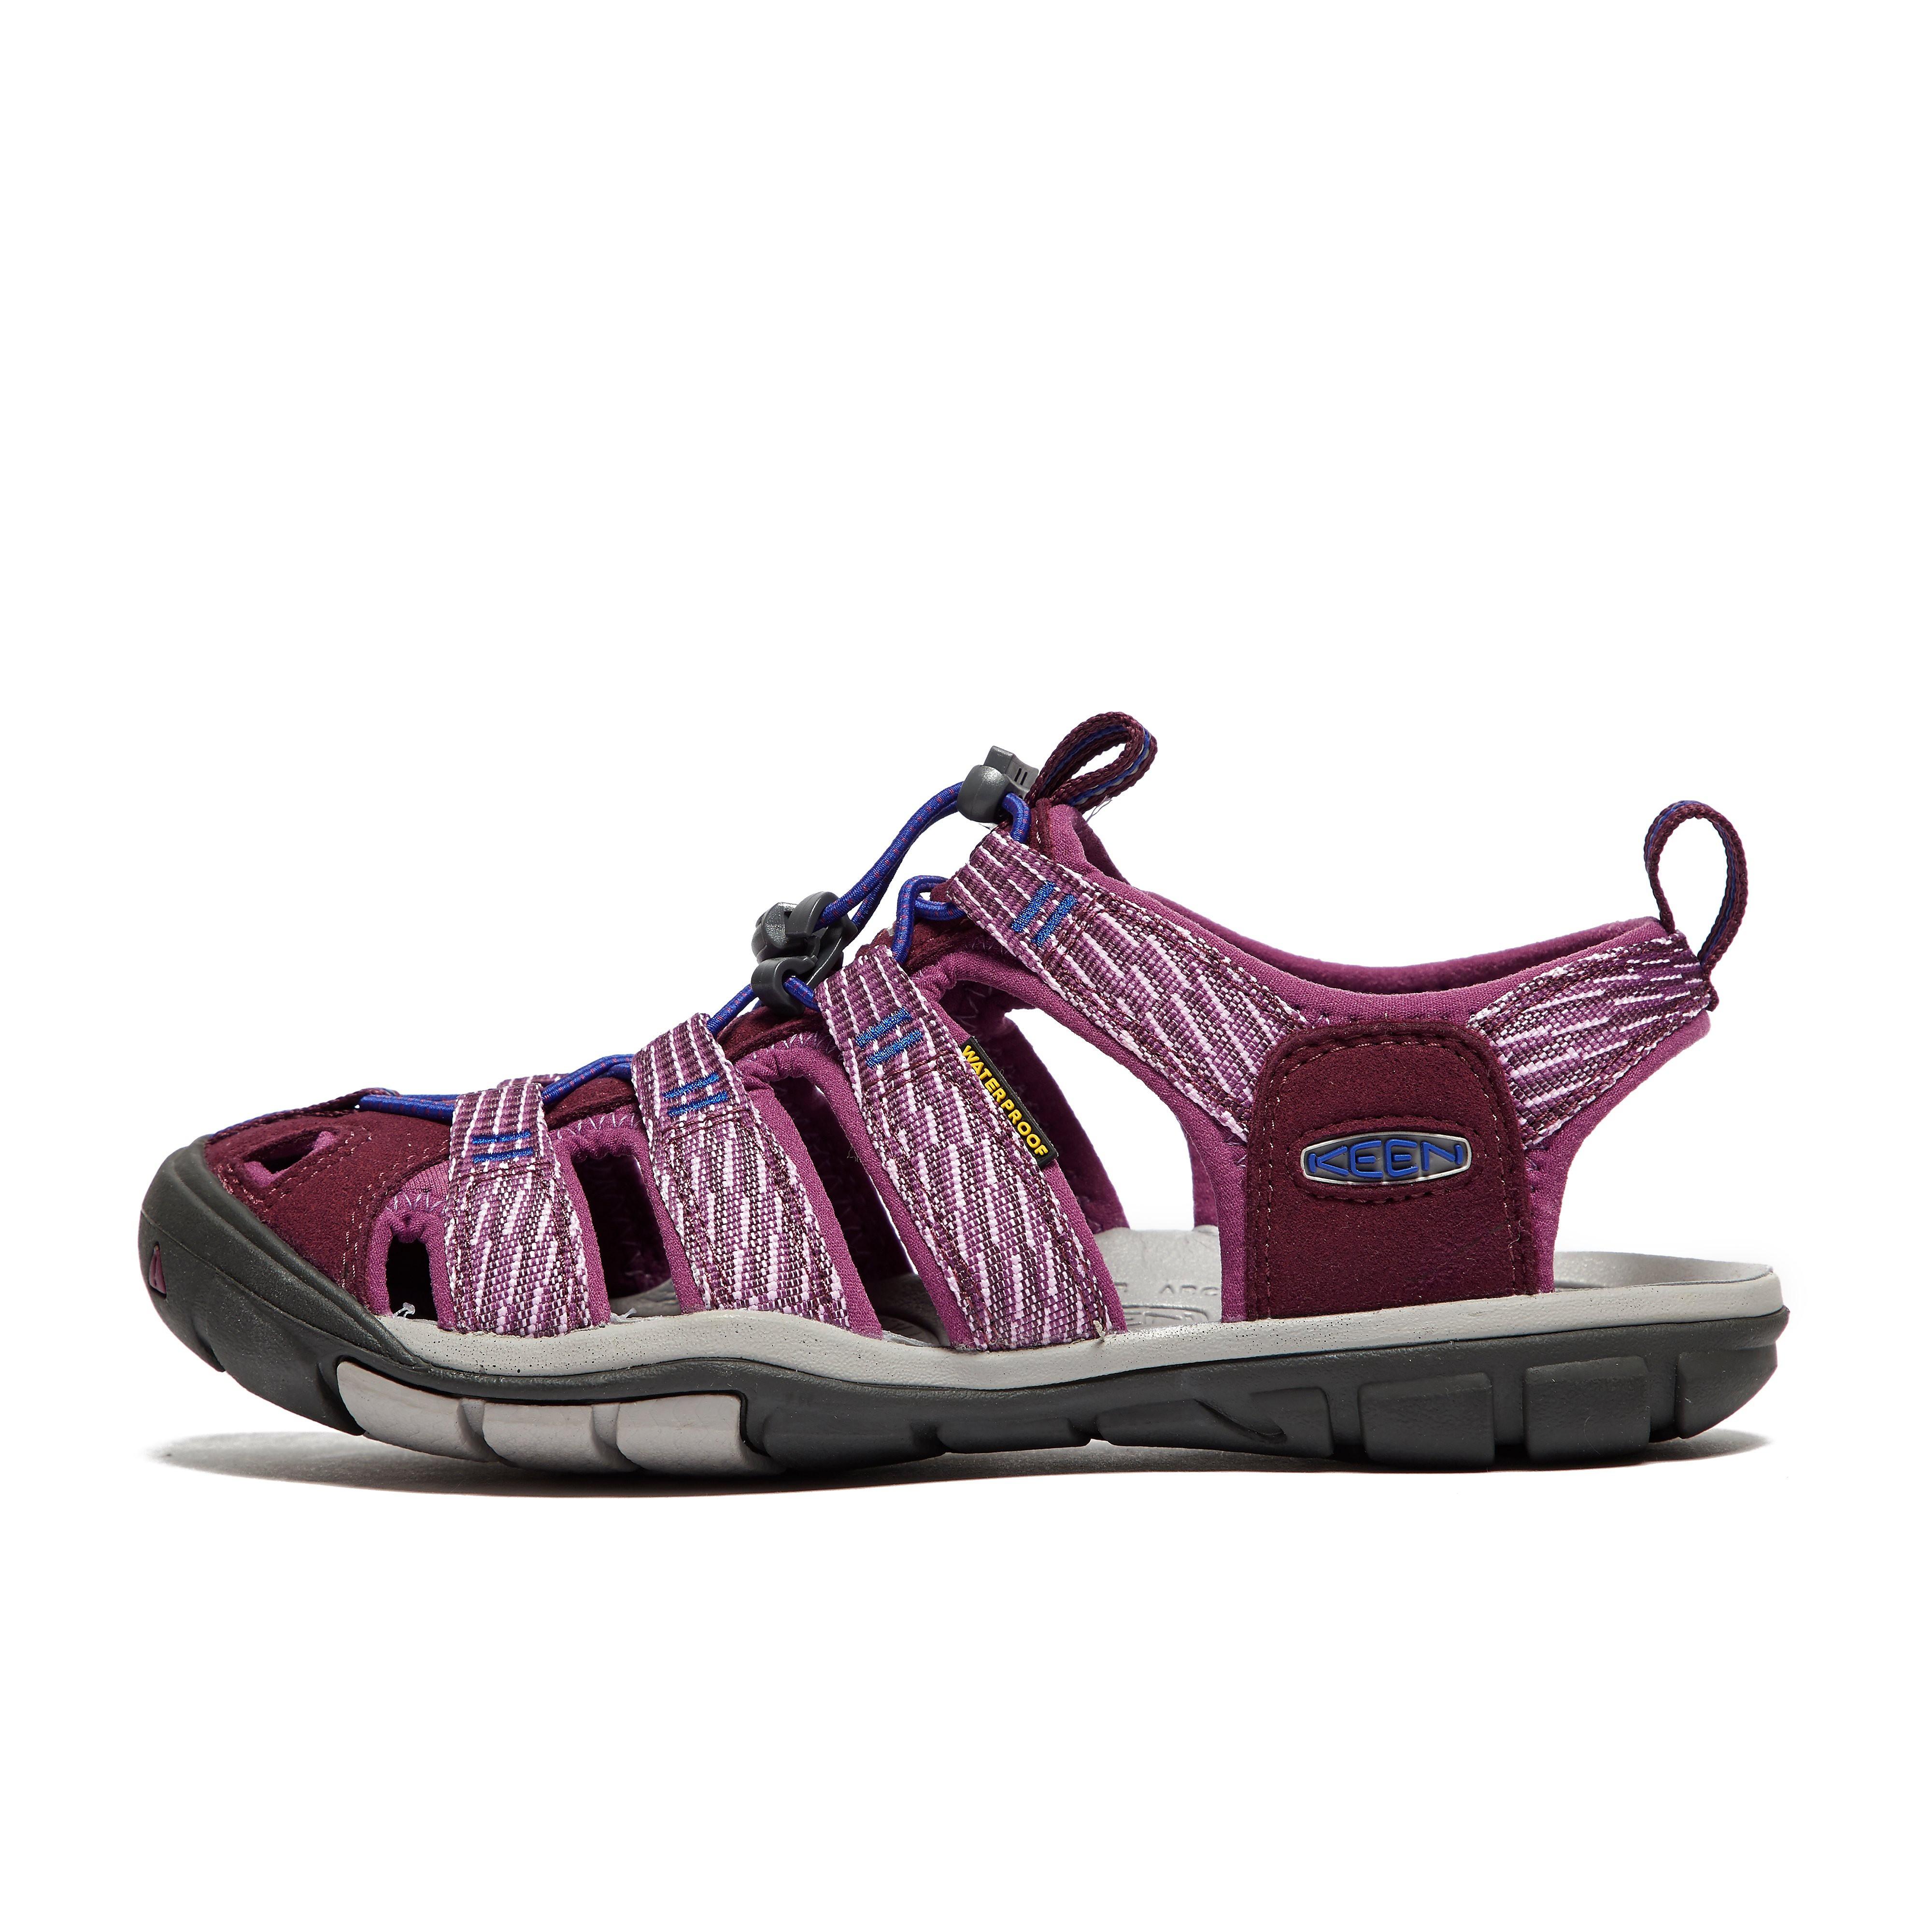 Keen Clearwater CNX Women's Walking Sandals